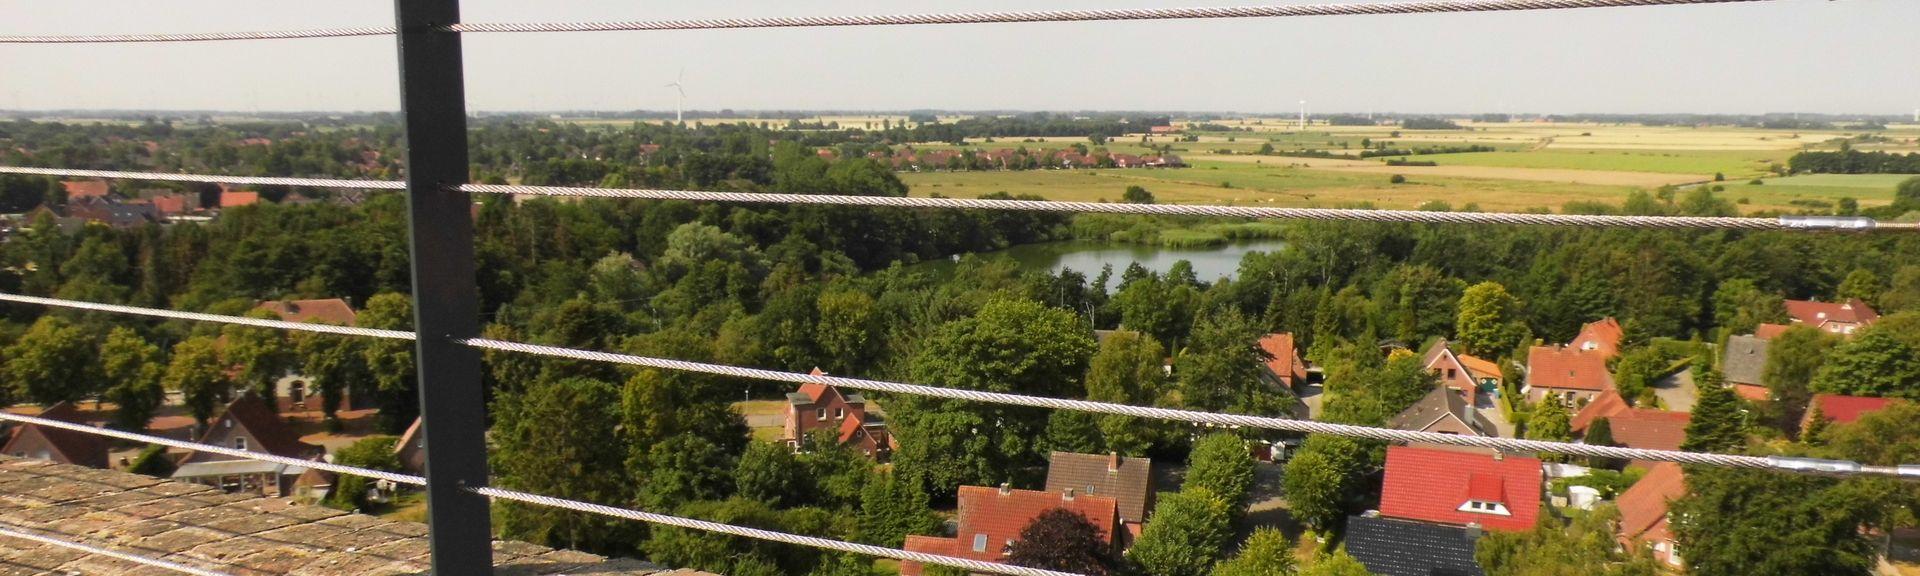 Weser-Ems, Lower Saxony, Germany